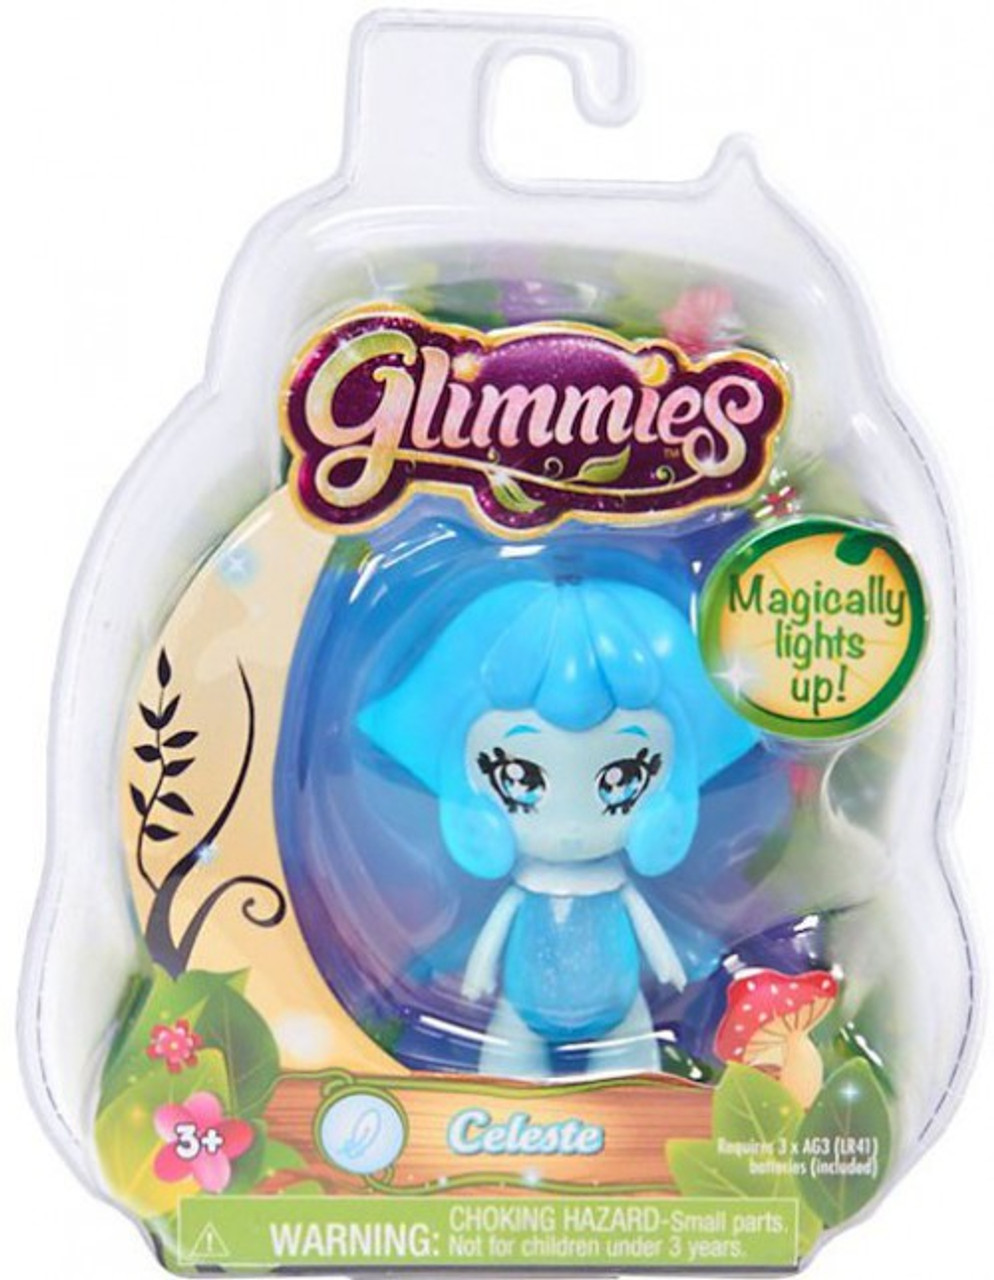 NEW GLIMMIES 10 Light Up Nova Celeste Dormilla Lumix Rubina Pluma Spinosita MORE